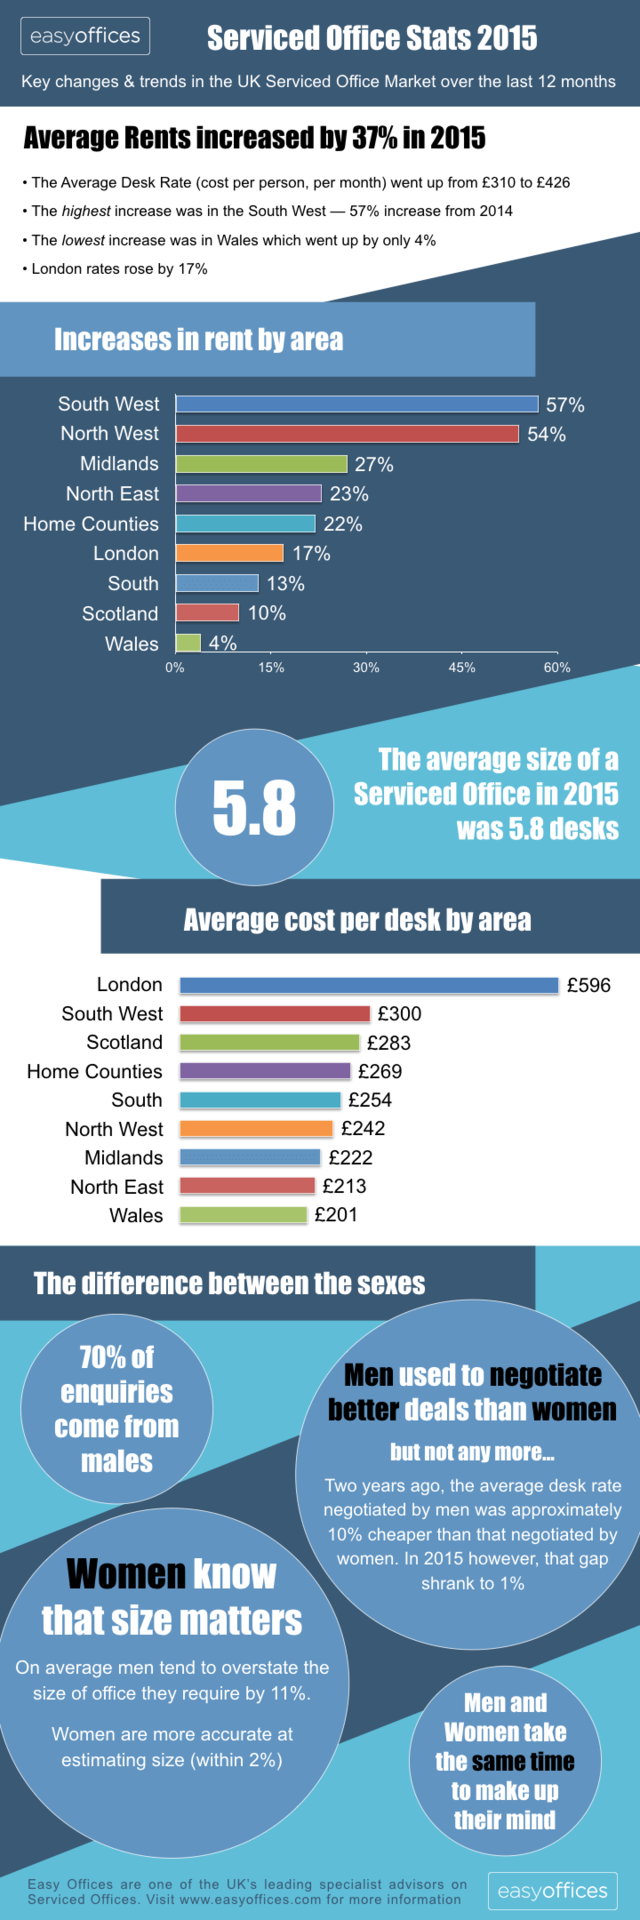 Uk serviced office stats 2015